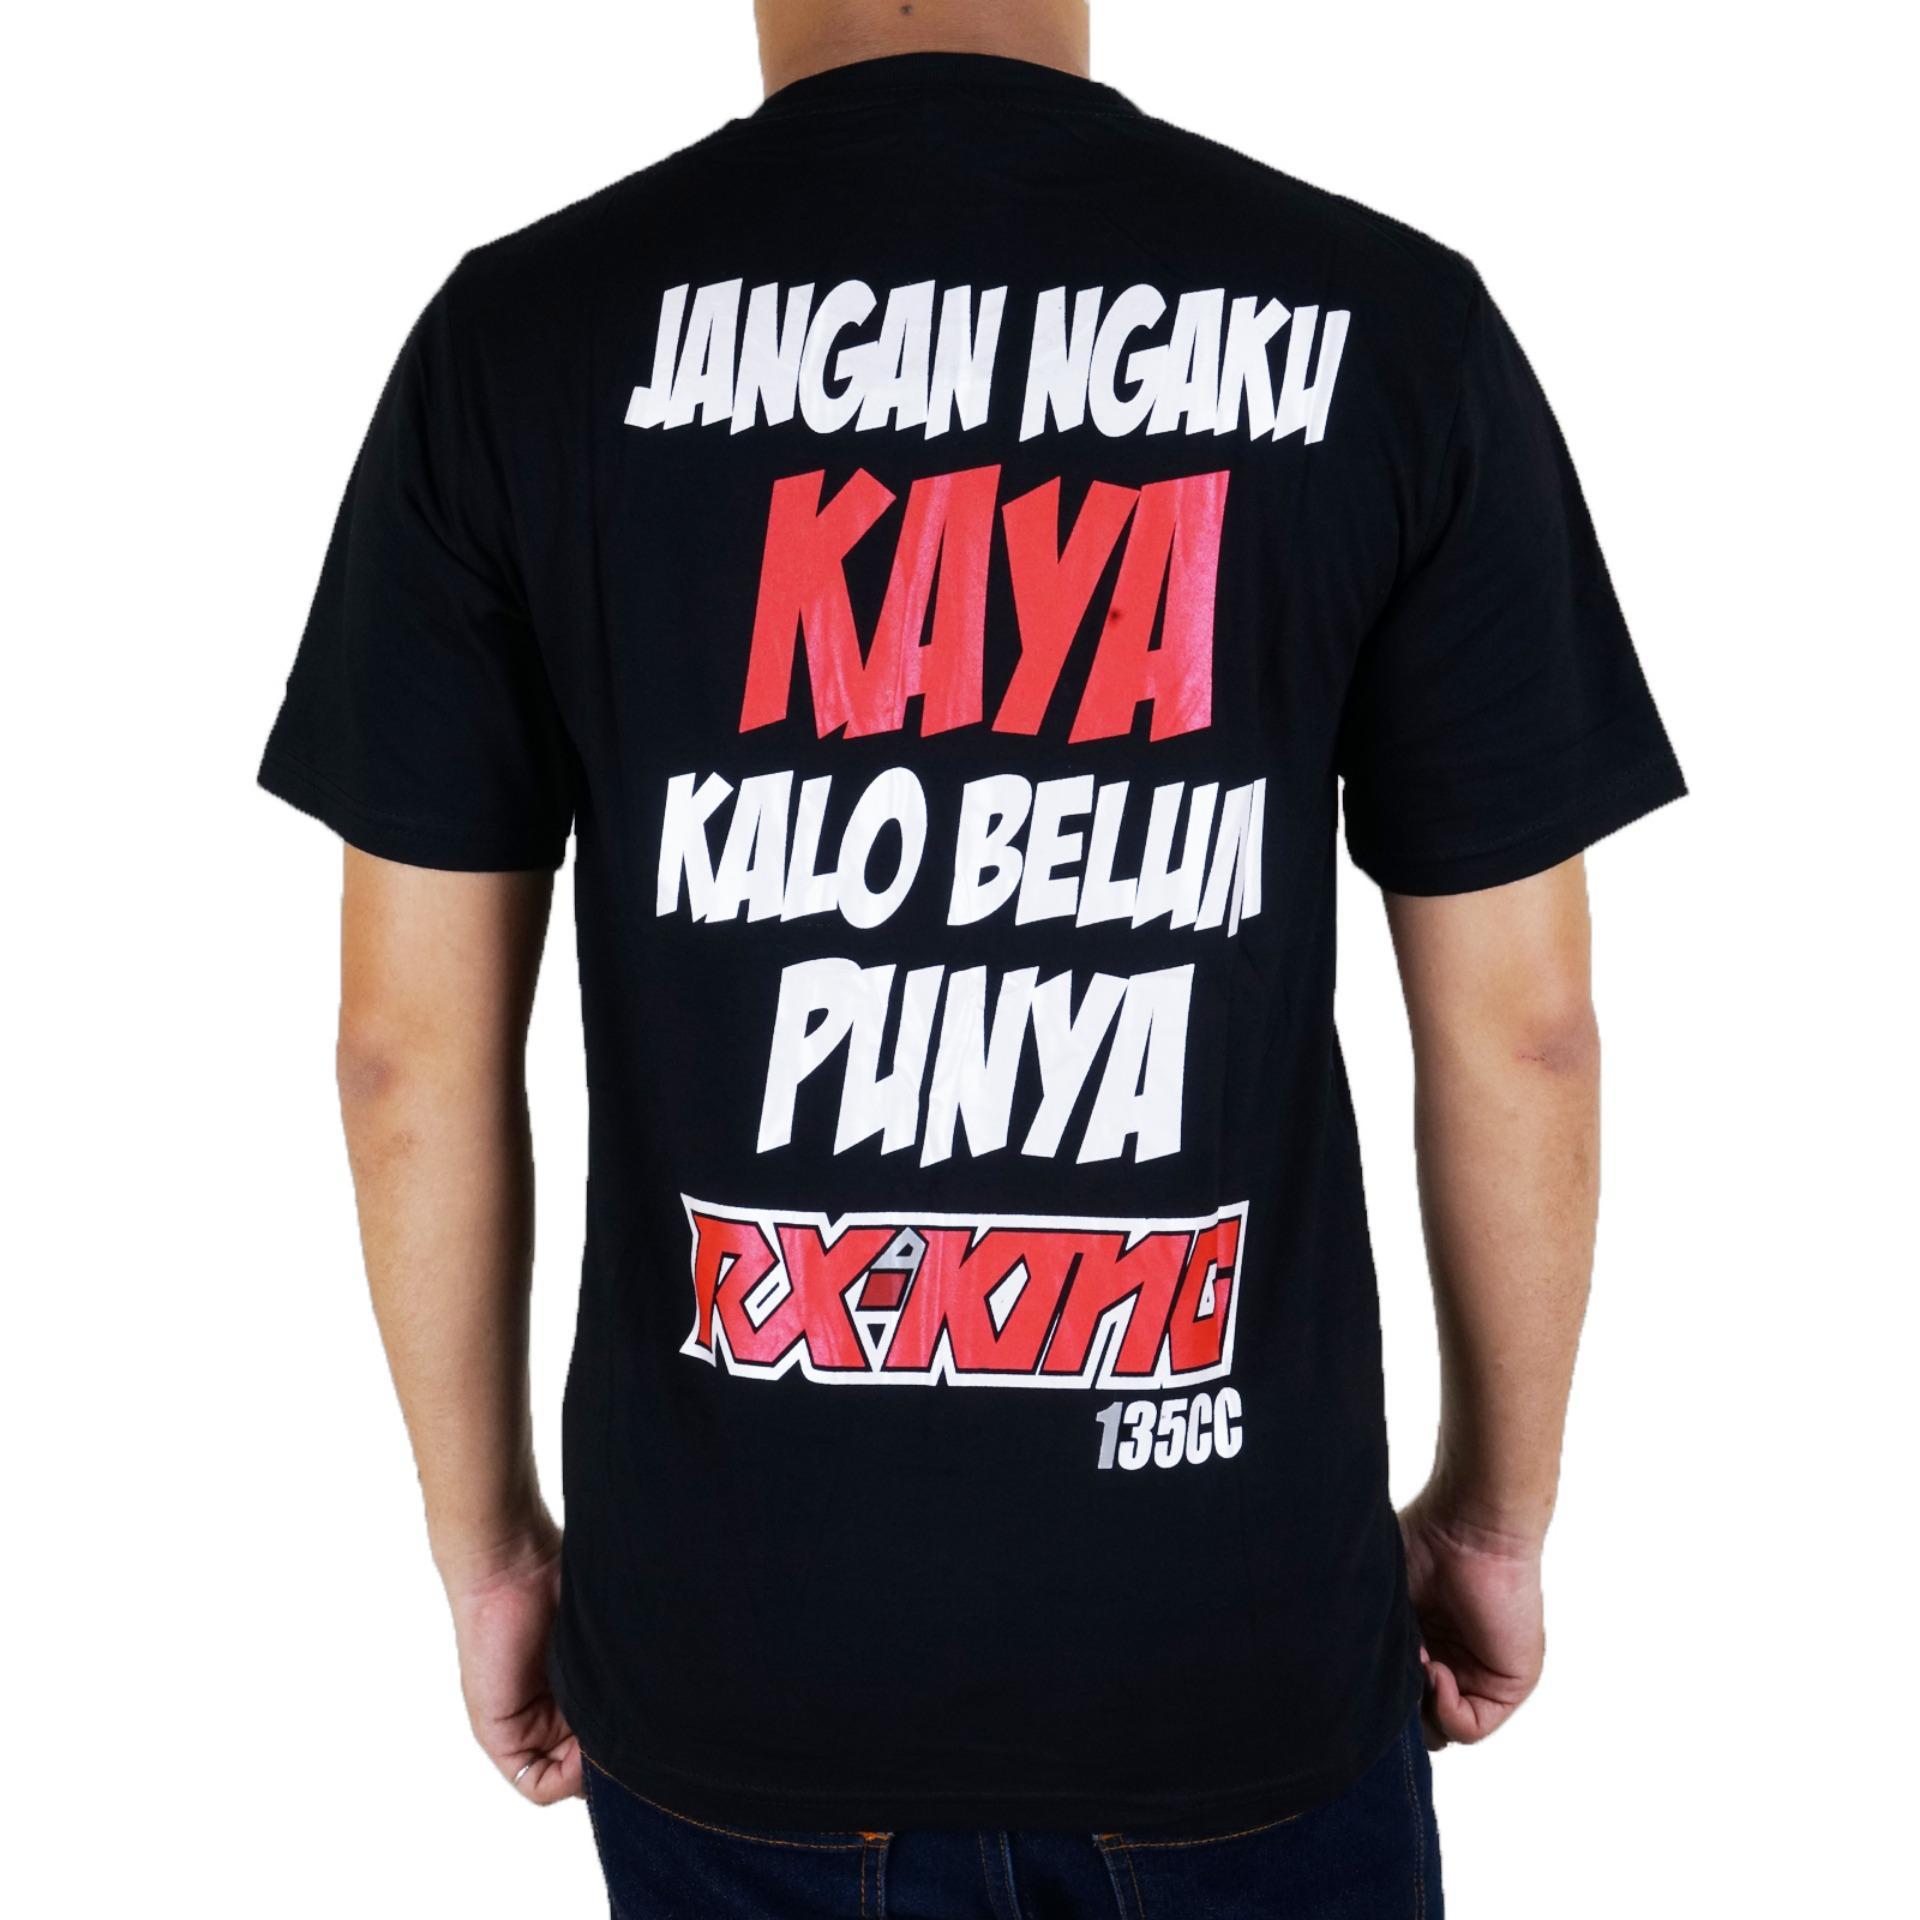 Detail Gambar Vanwin - Kaos T-Shirt Distro / kaos Pria / Tshirt Pria / Distro Pria / Baju Pria Premium Racing RX King Fighting - Hitam Terbaru